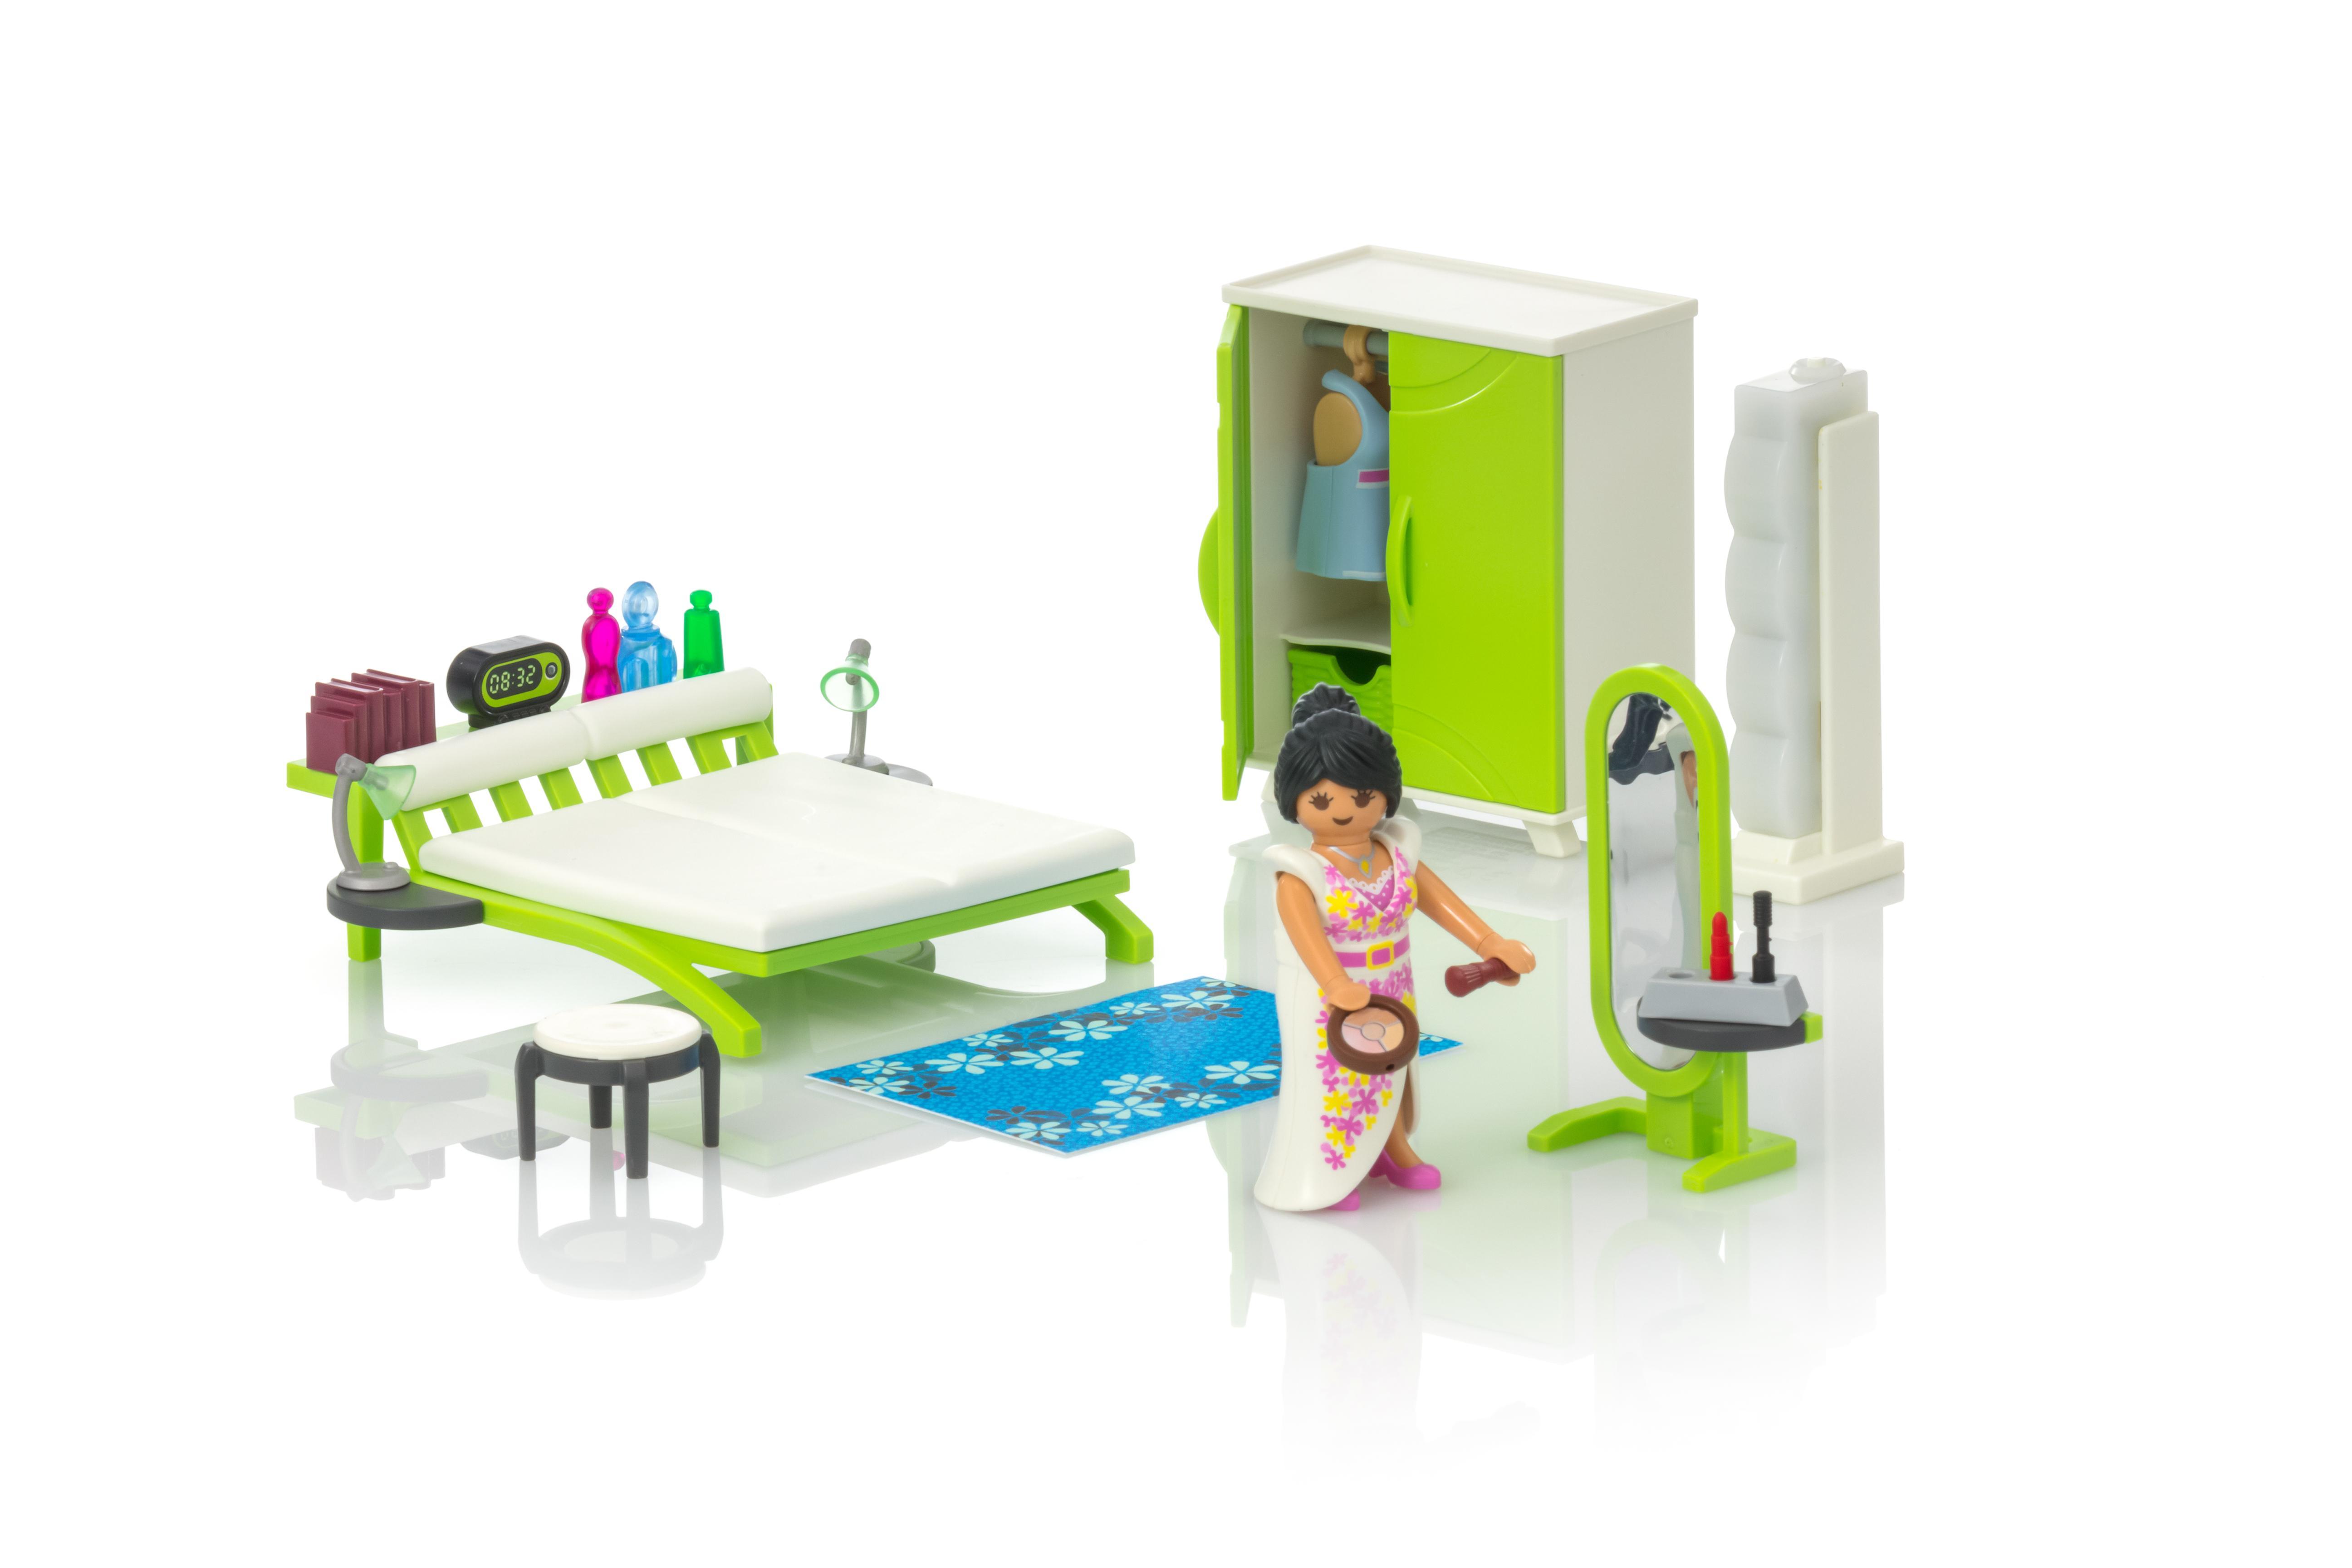 Playmobil Dollhouse Slaapkamer : Slaapkamer met make up tafel playmobil belgië